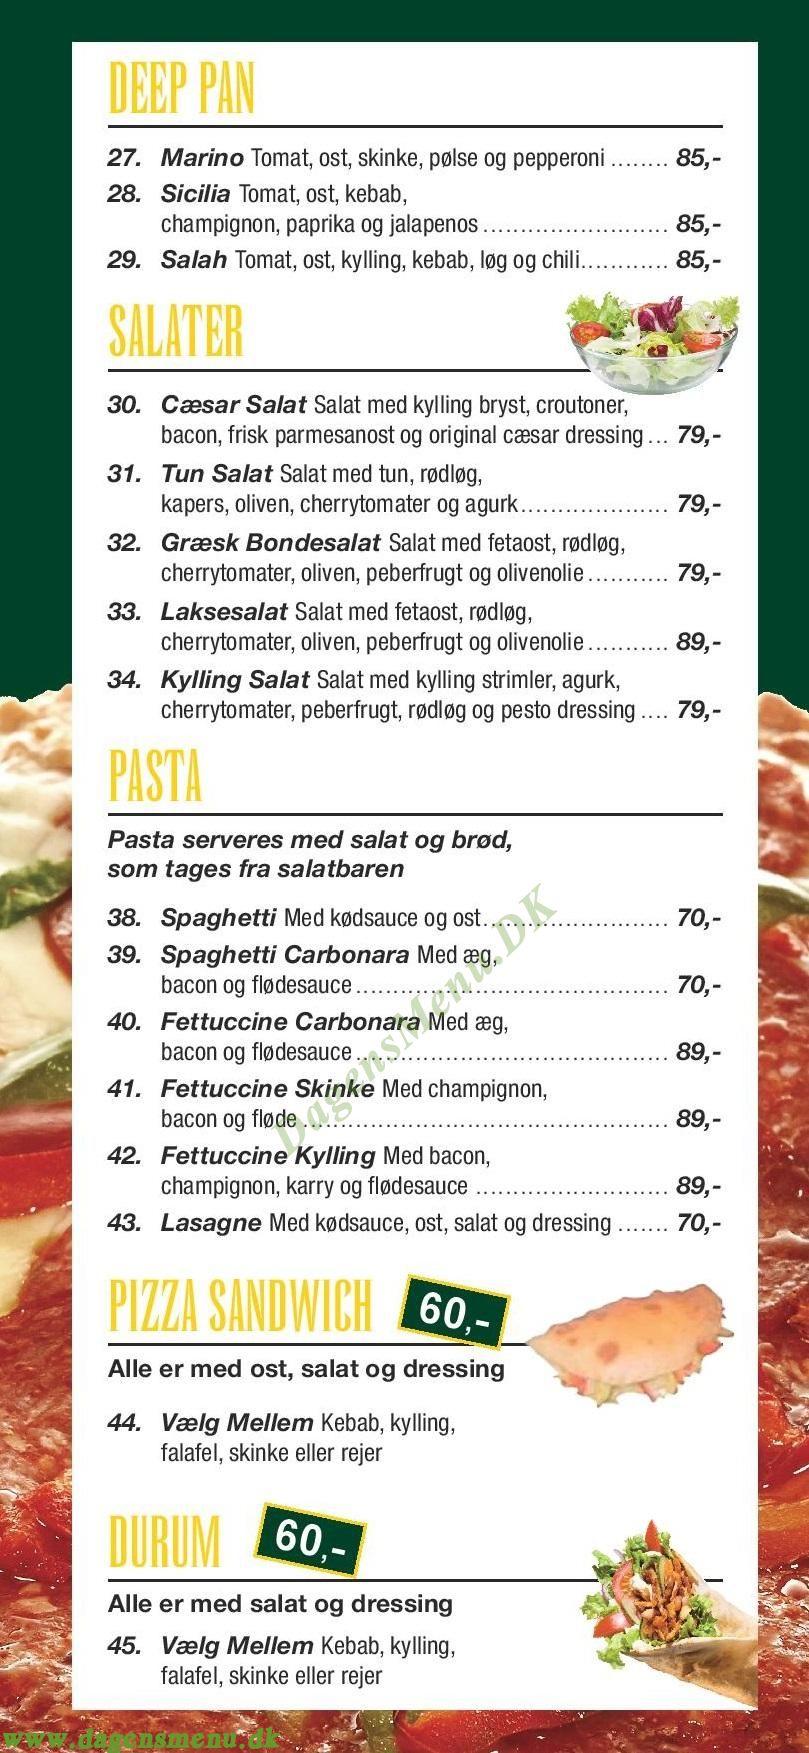 Incow Cafe & Restaurant - Menukort